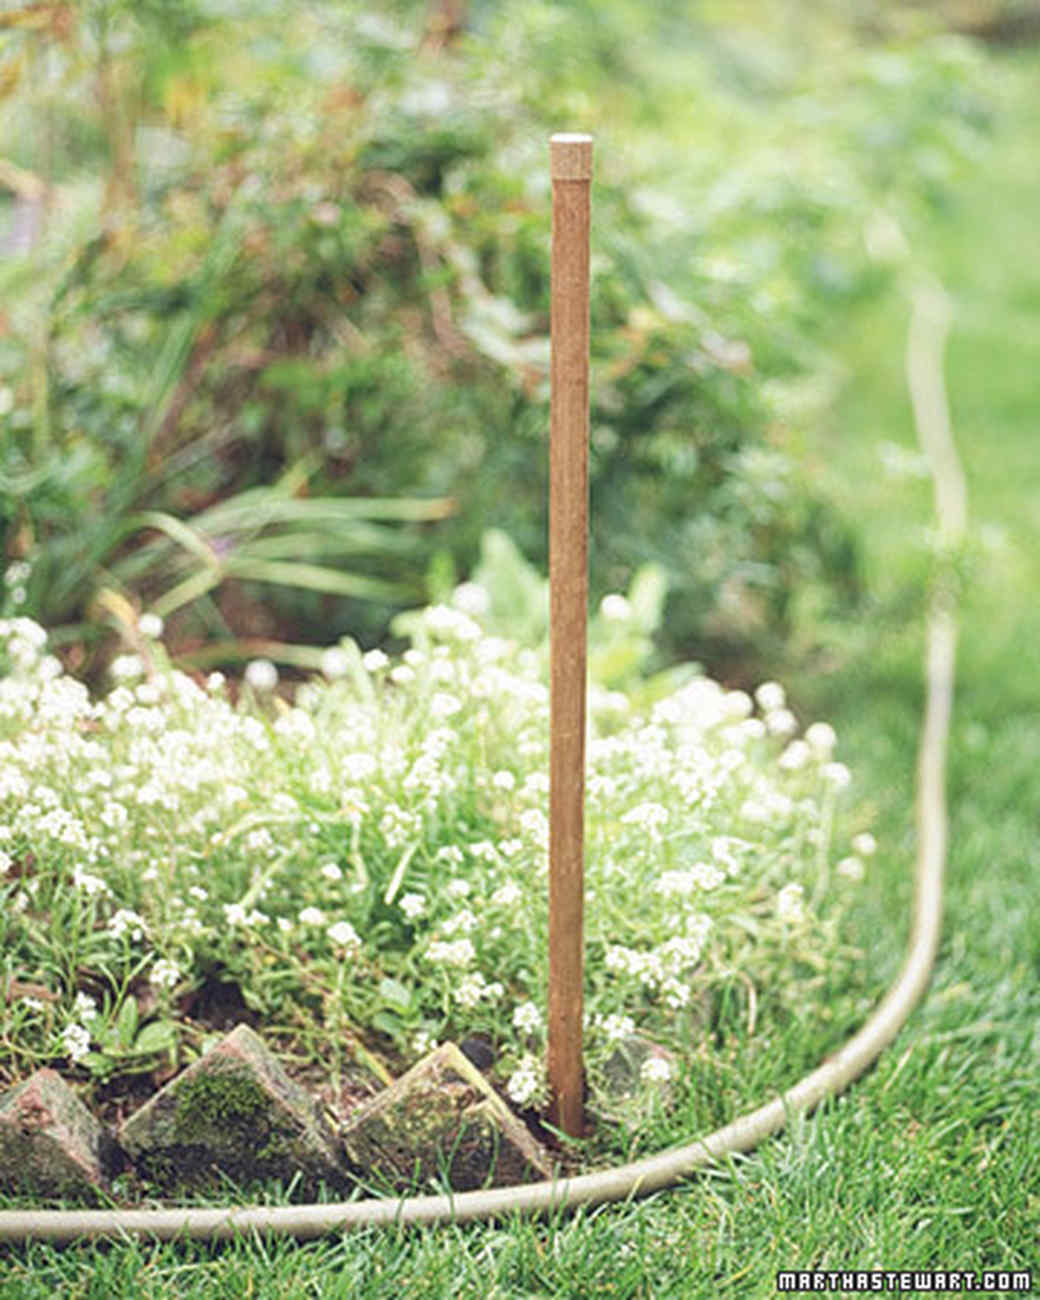 gt04augmsl_gardenprotector1.jpg